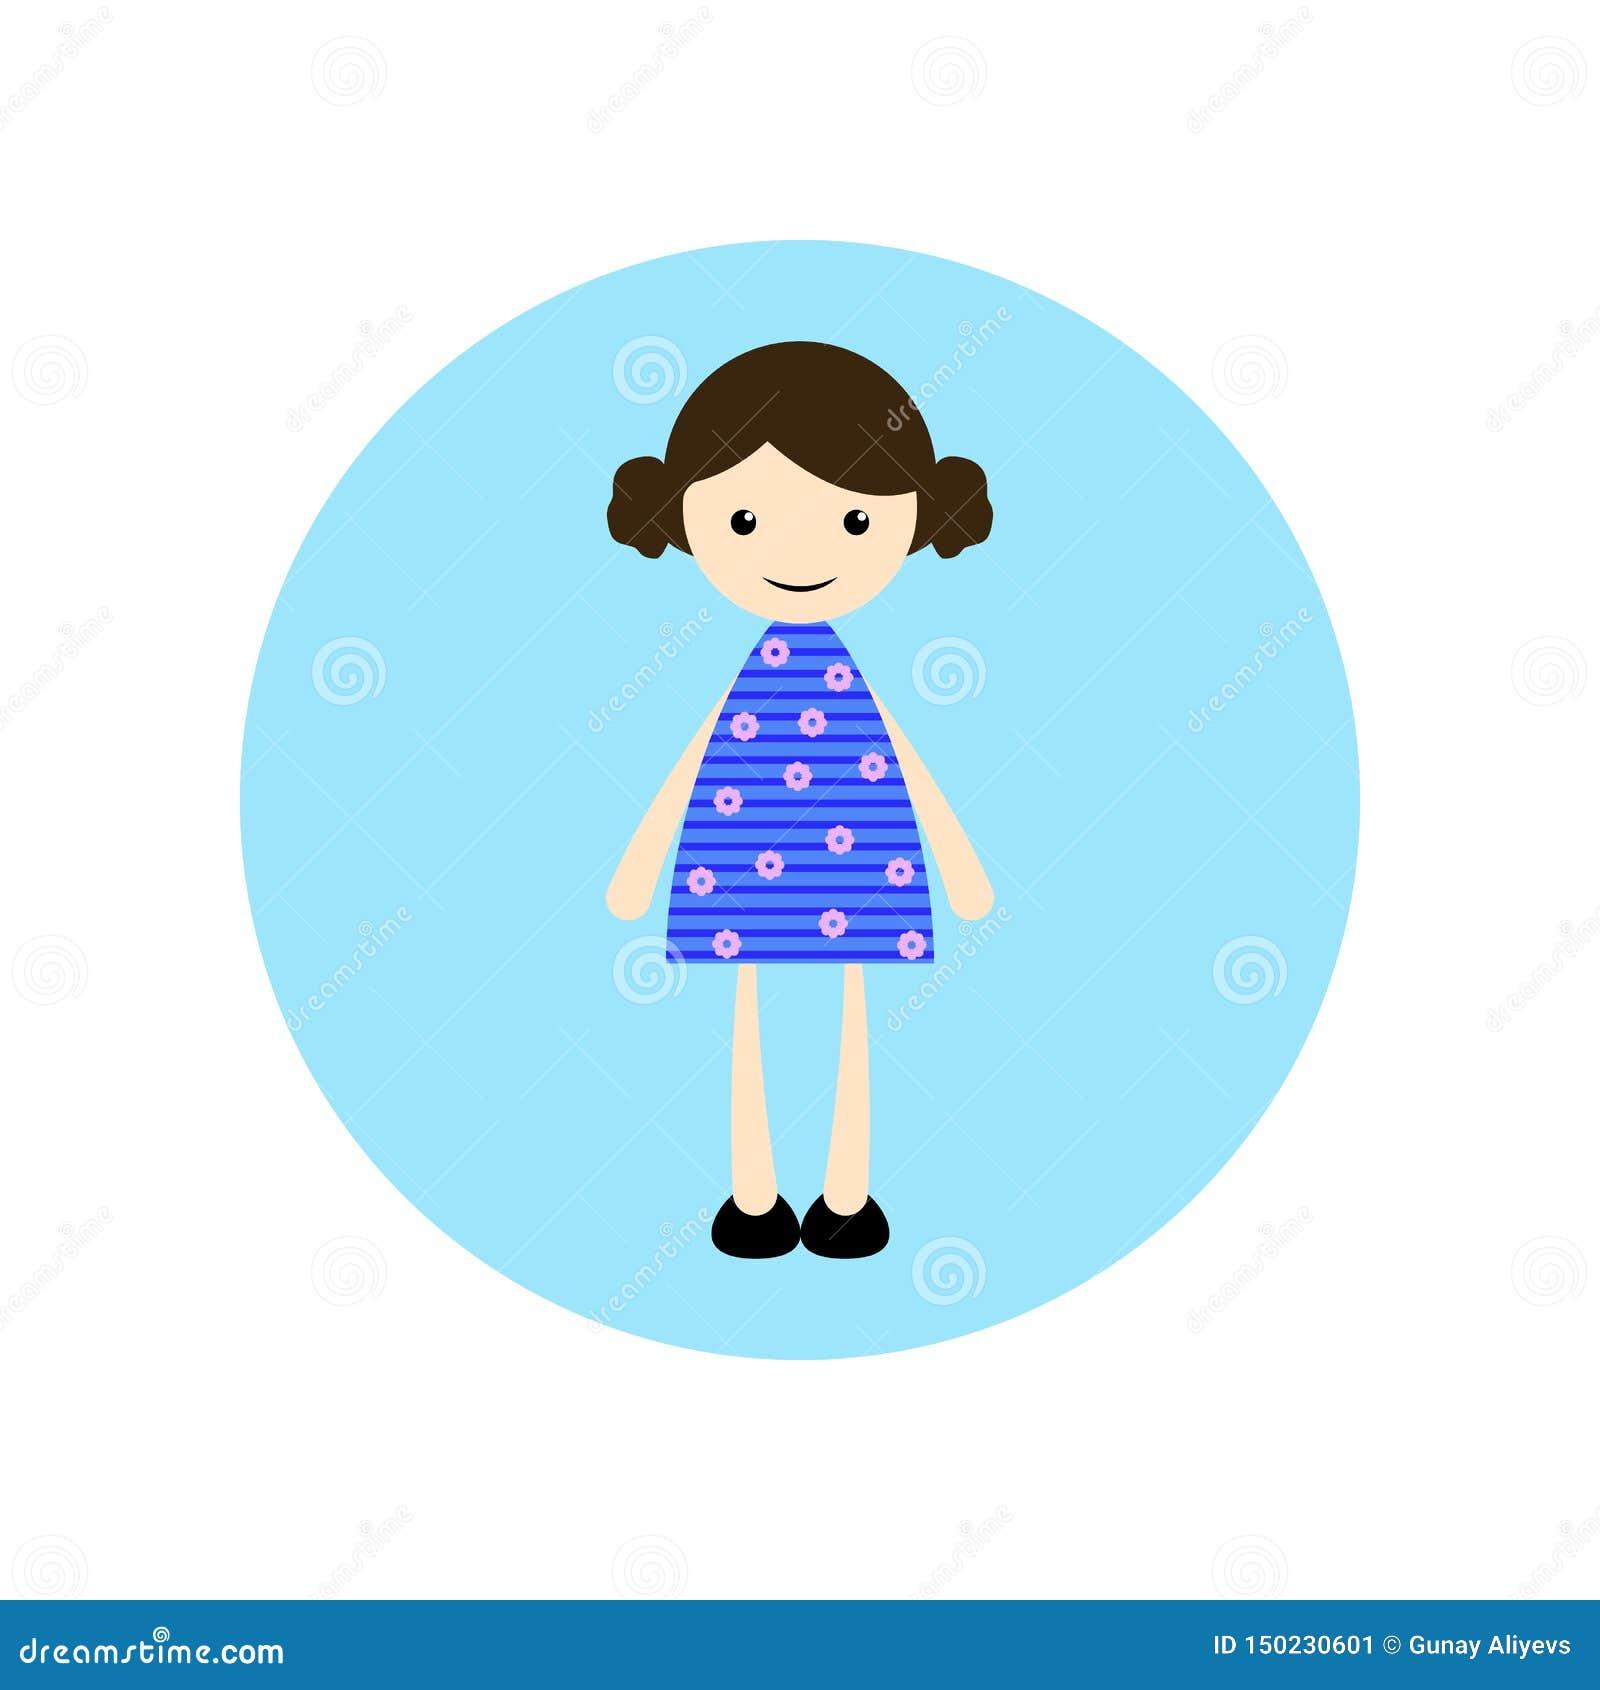 Young, girl illustration, flat animated cartoon illustration